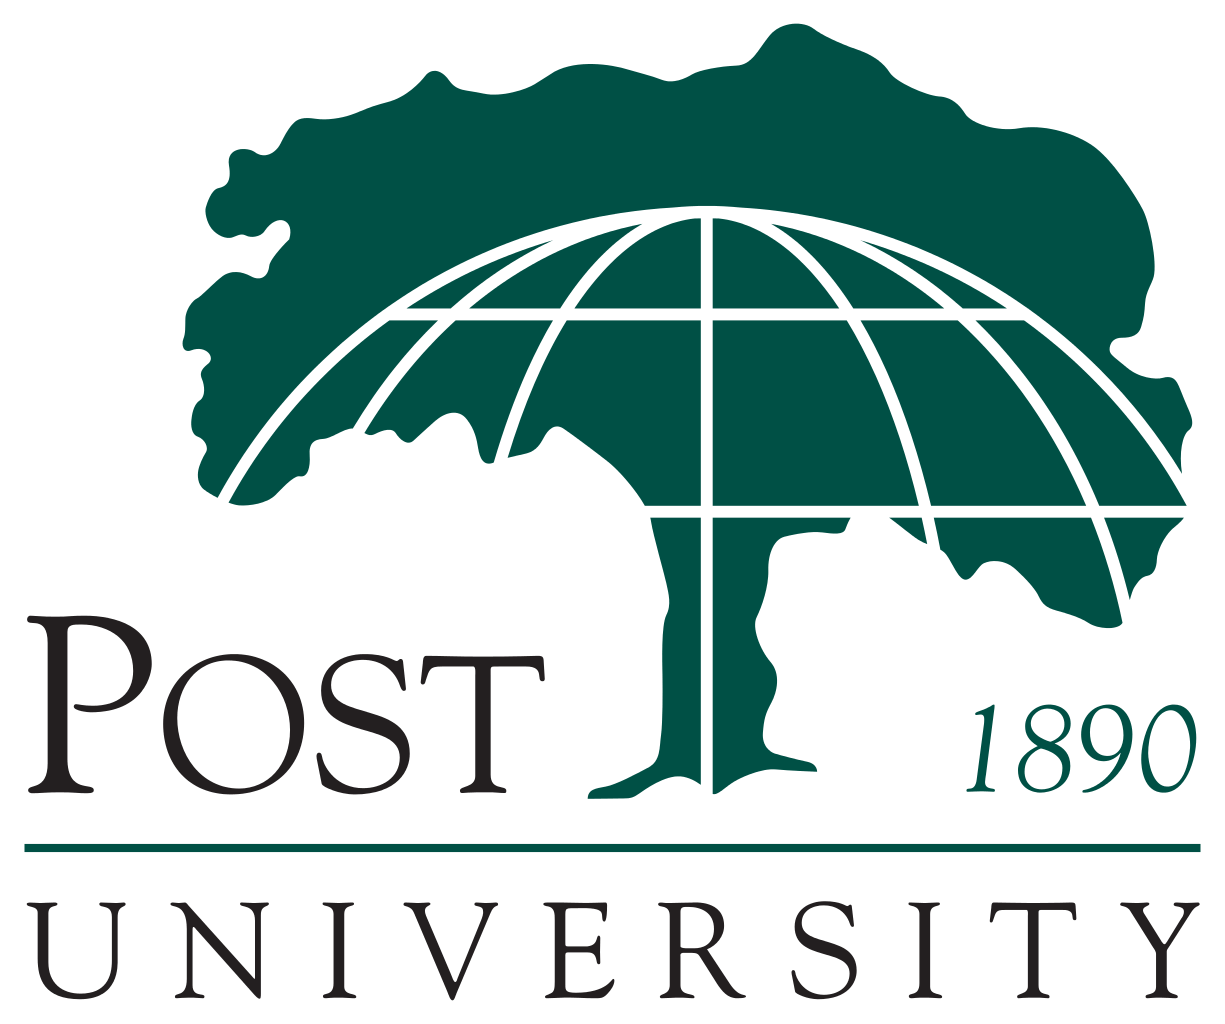 Post_University